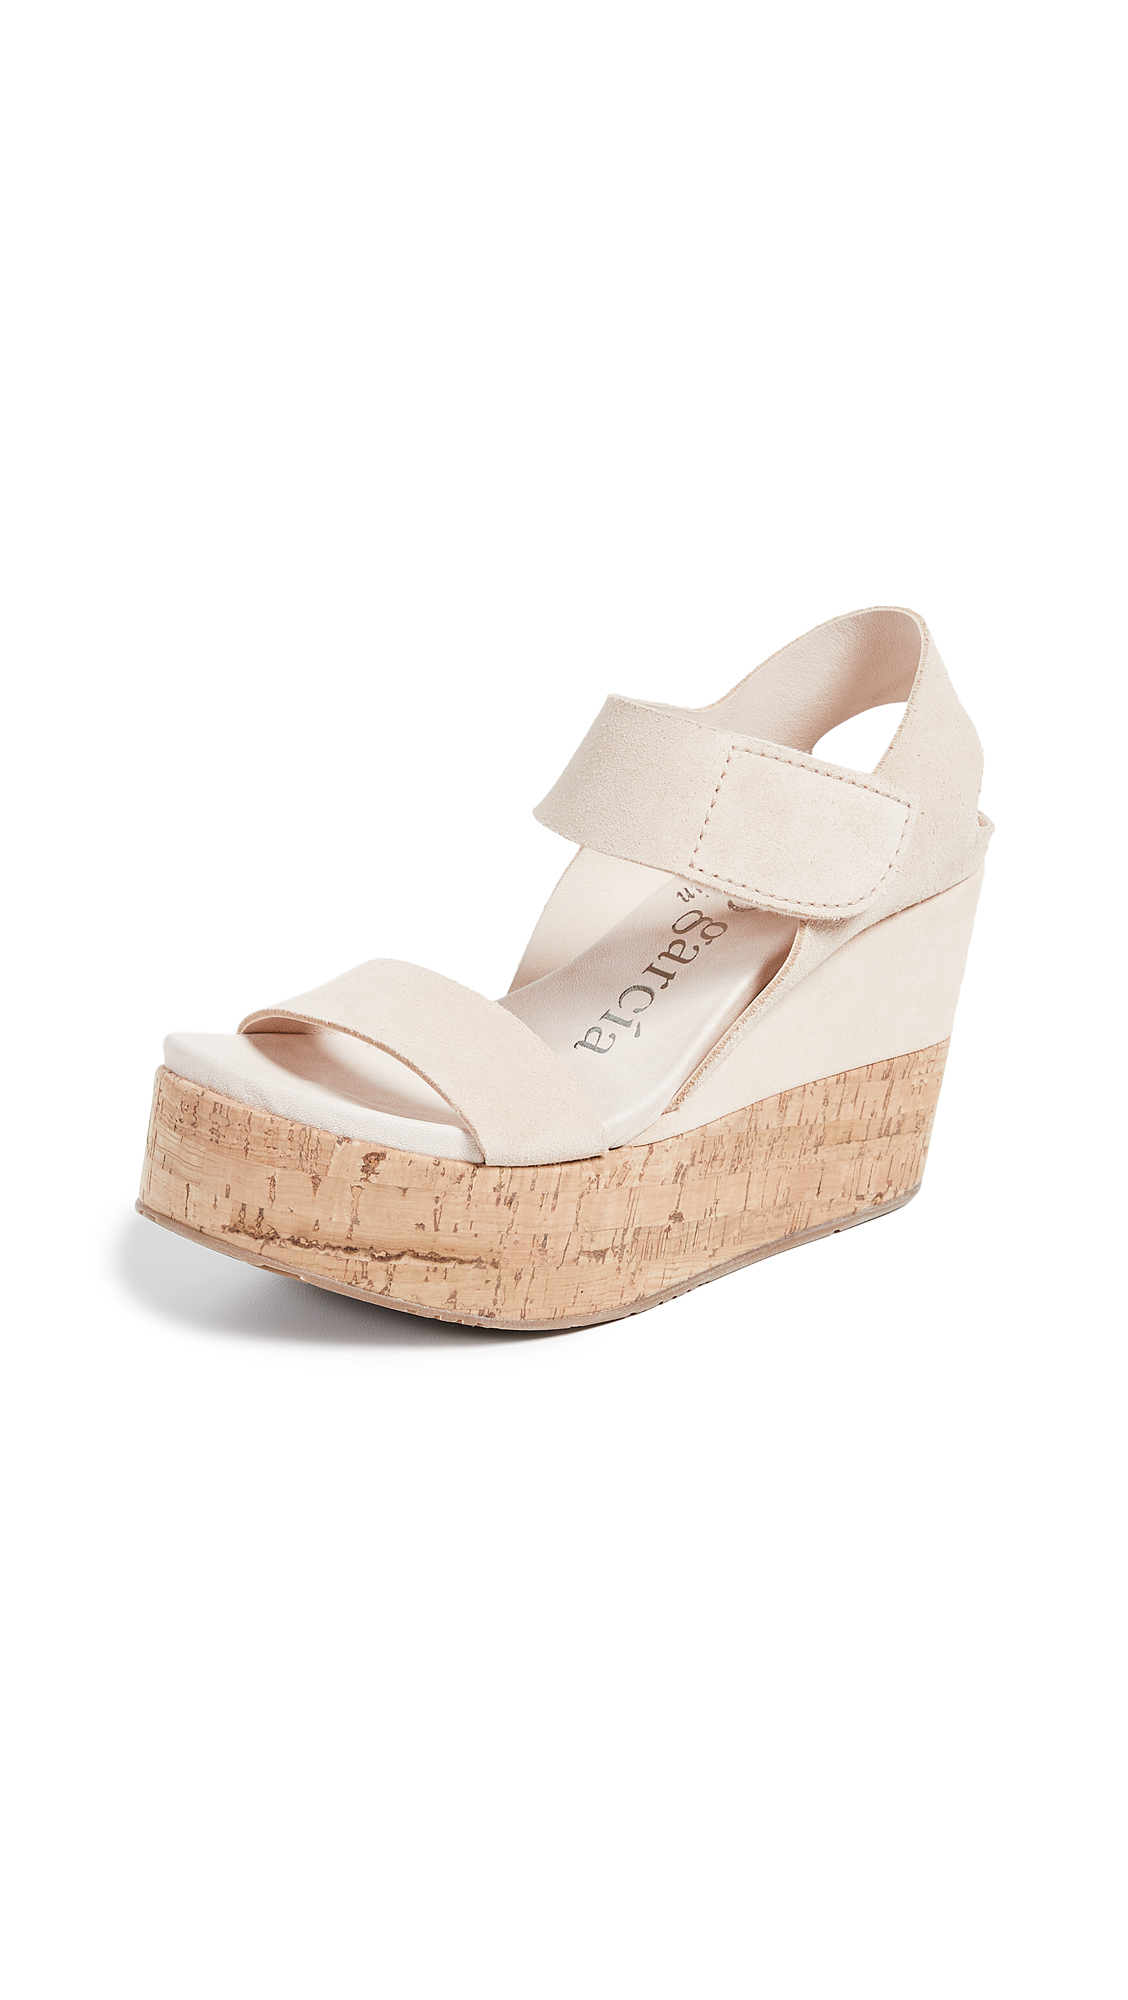 Pedro Garcia Daire Platform Wedge Sandals - Plume